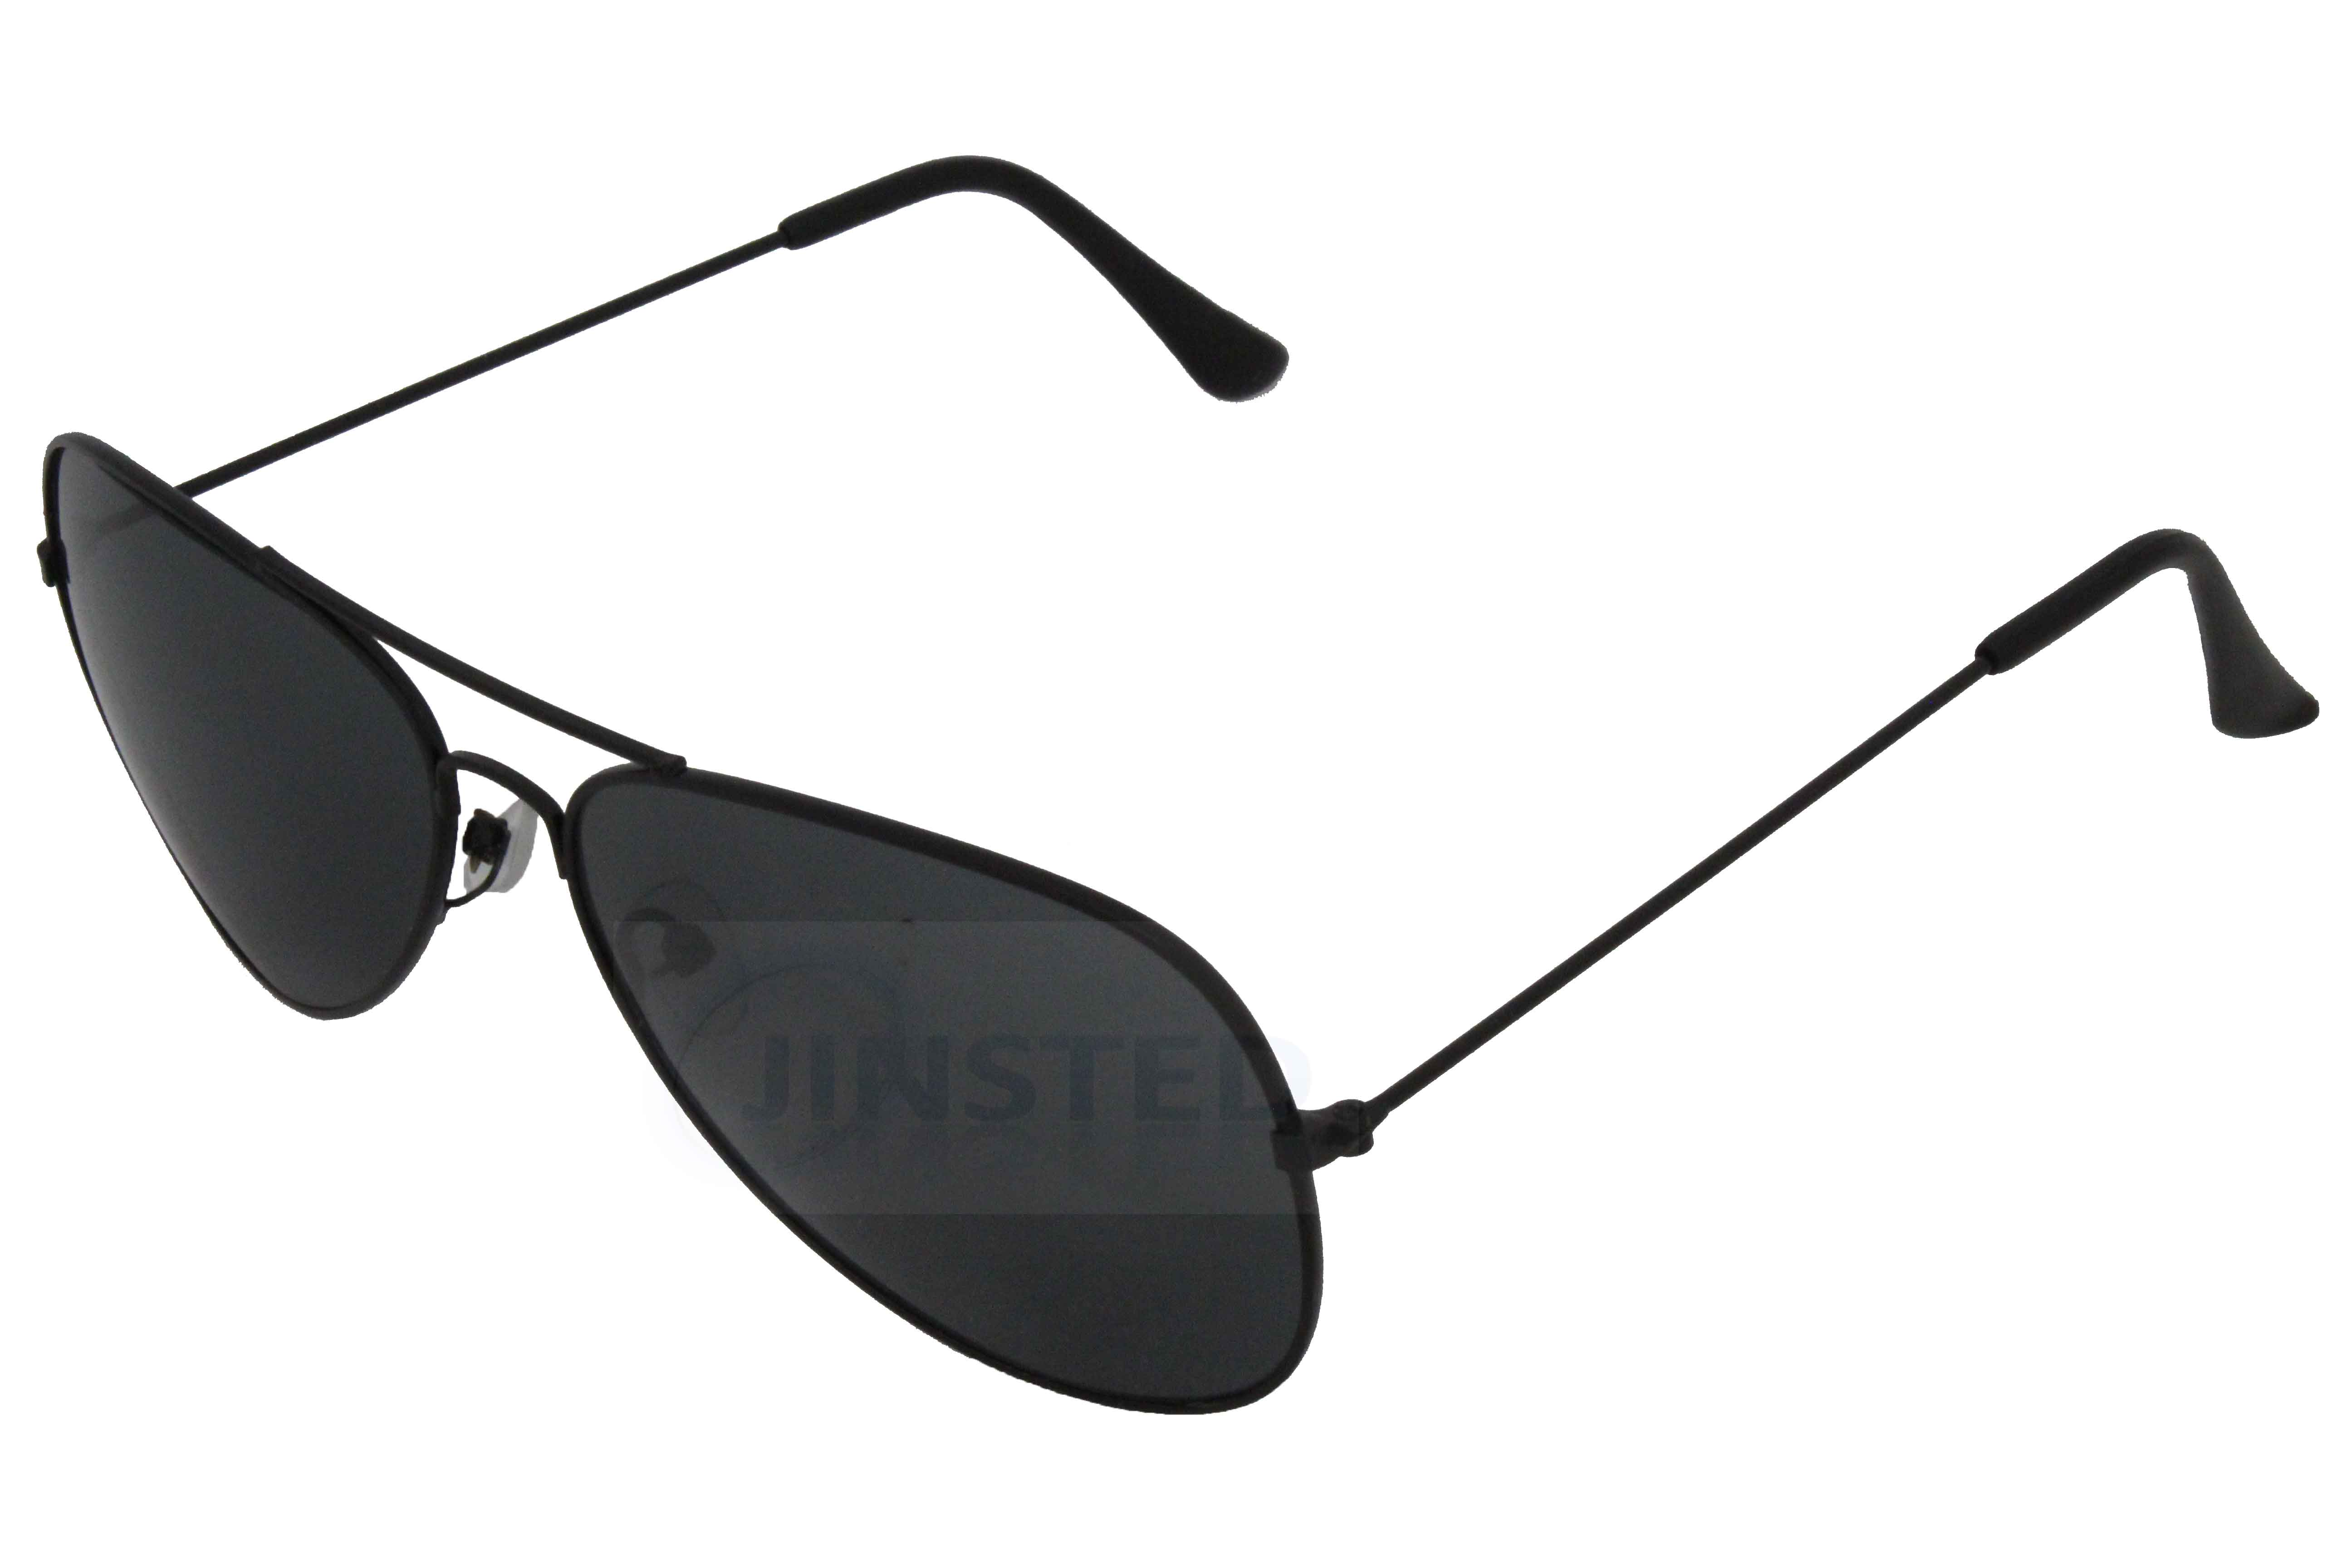 George Michael Gold Rimmed Aviator Style Mens Designer Sunglasses Pilots Shades